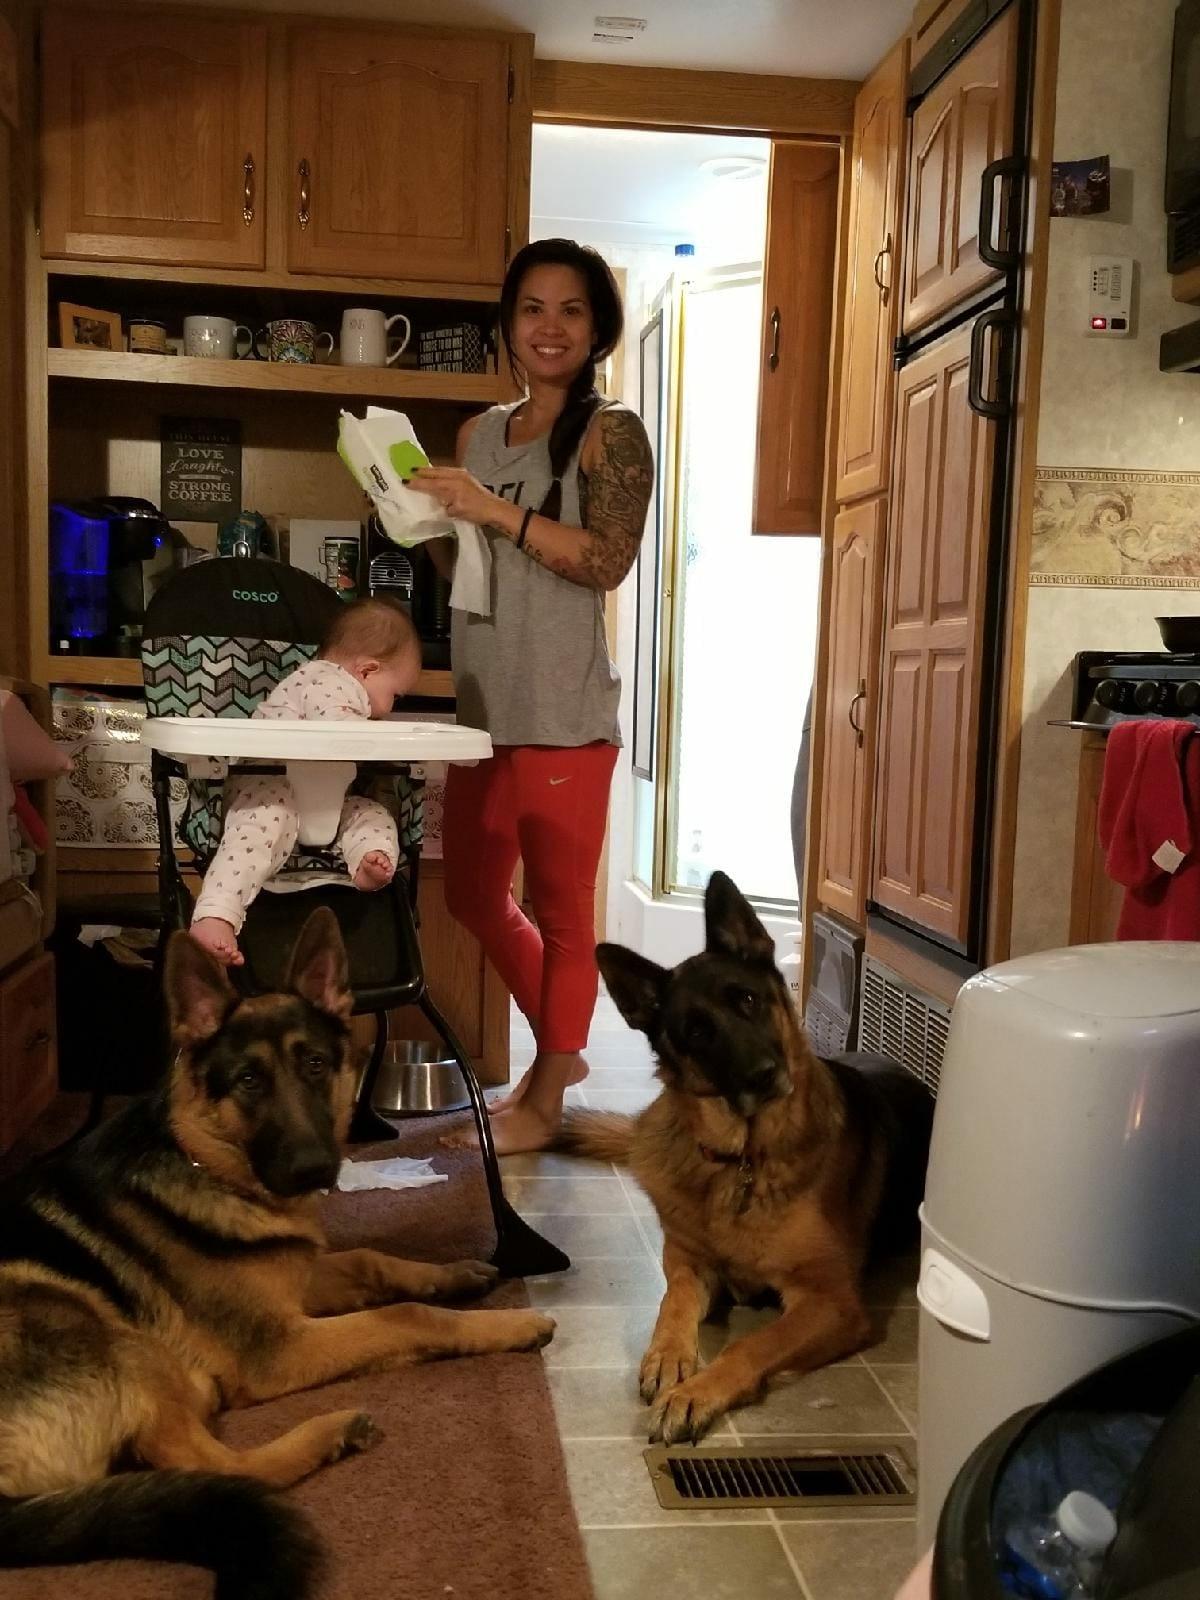 Busy mom life!